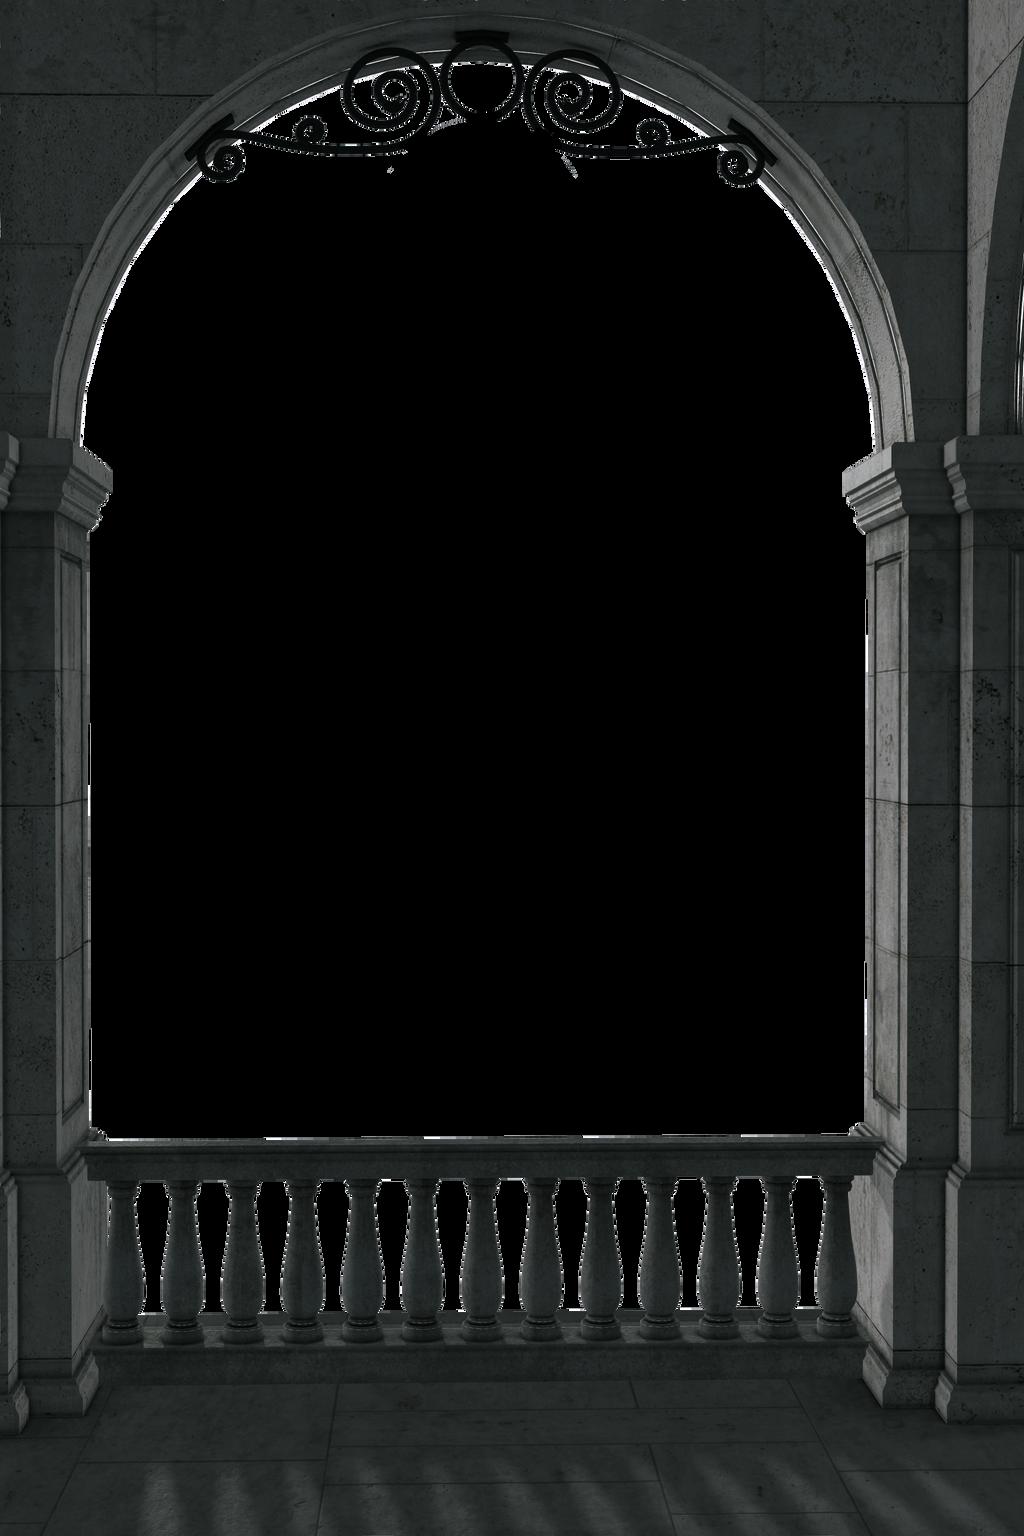 RESTRICTED - Balcony Scene